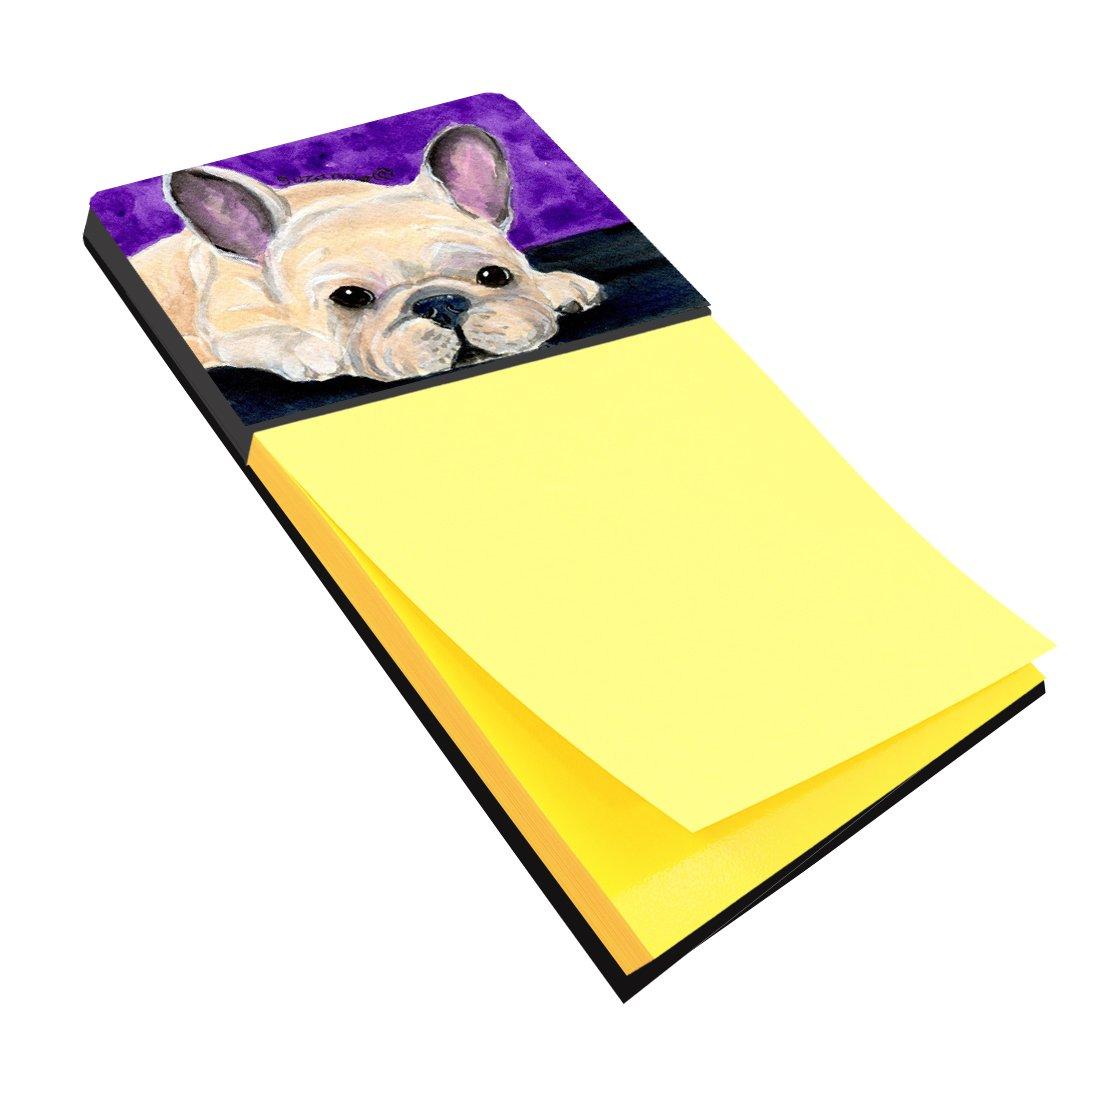 Caroline's Treasures SS8698SN French Bulldog Refiillable Sticky Note Holder or Postit Note Dispenser, Large, Multicolor